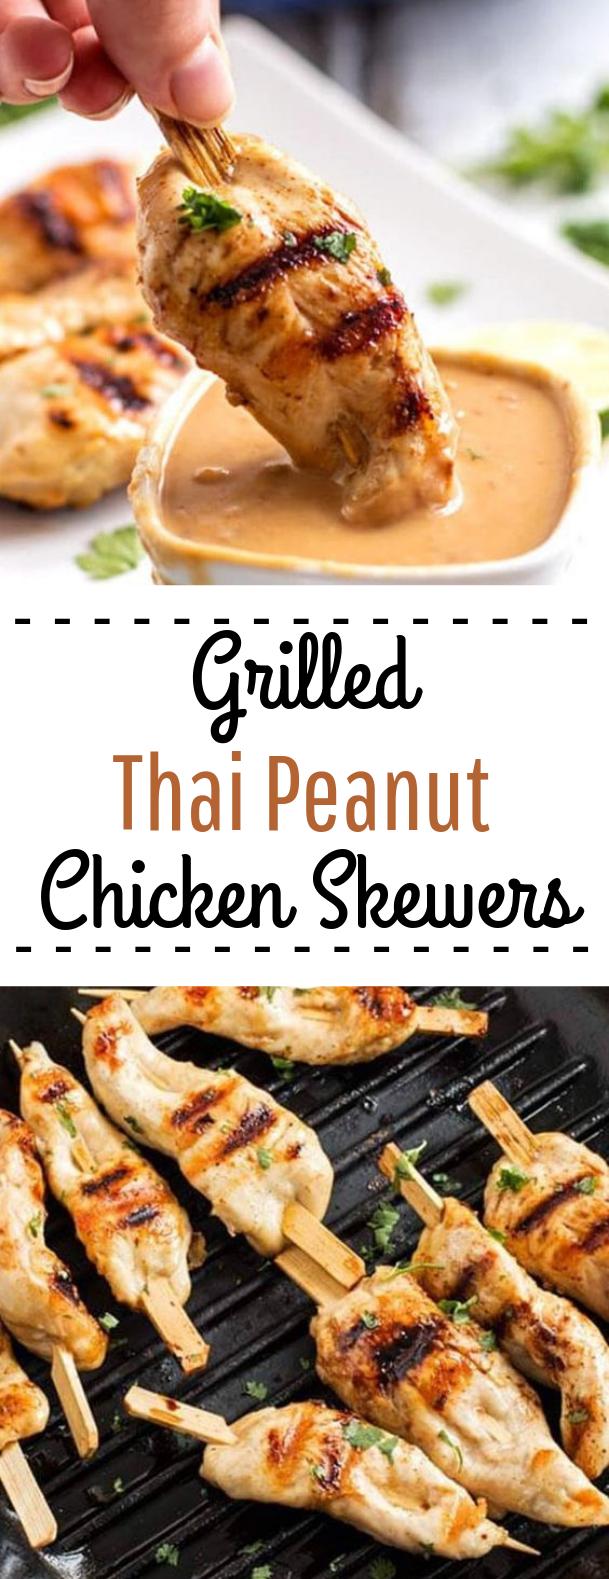 Thai Peanut Chicken Skewers #skewers #chicken